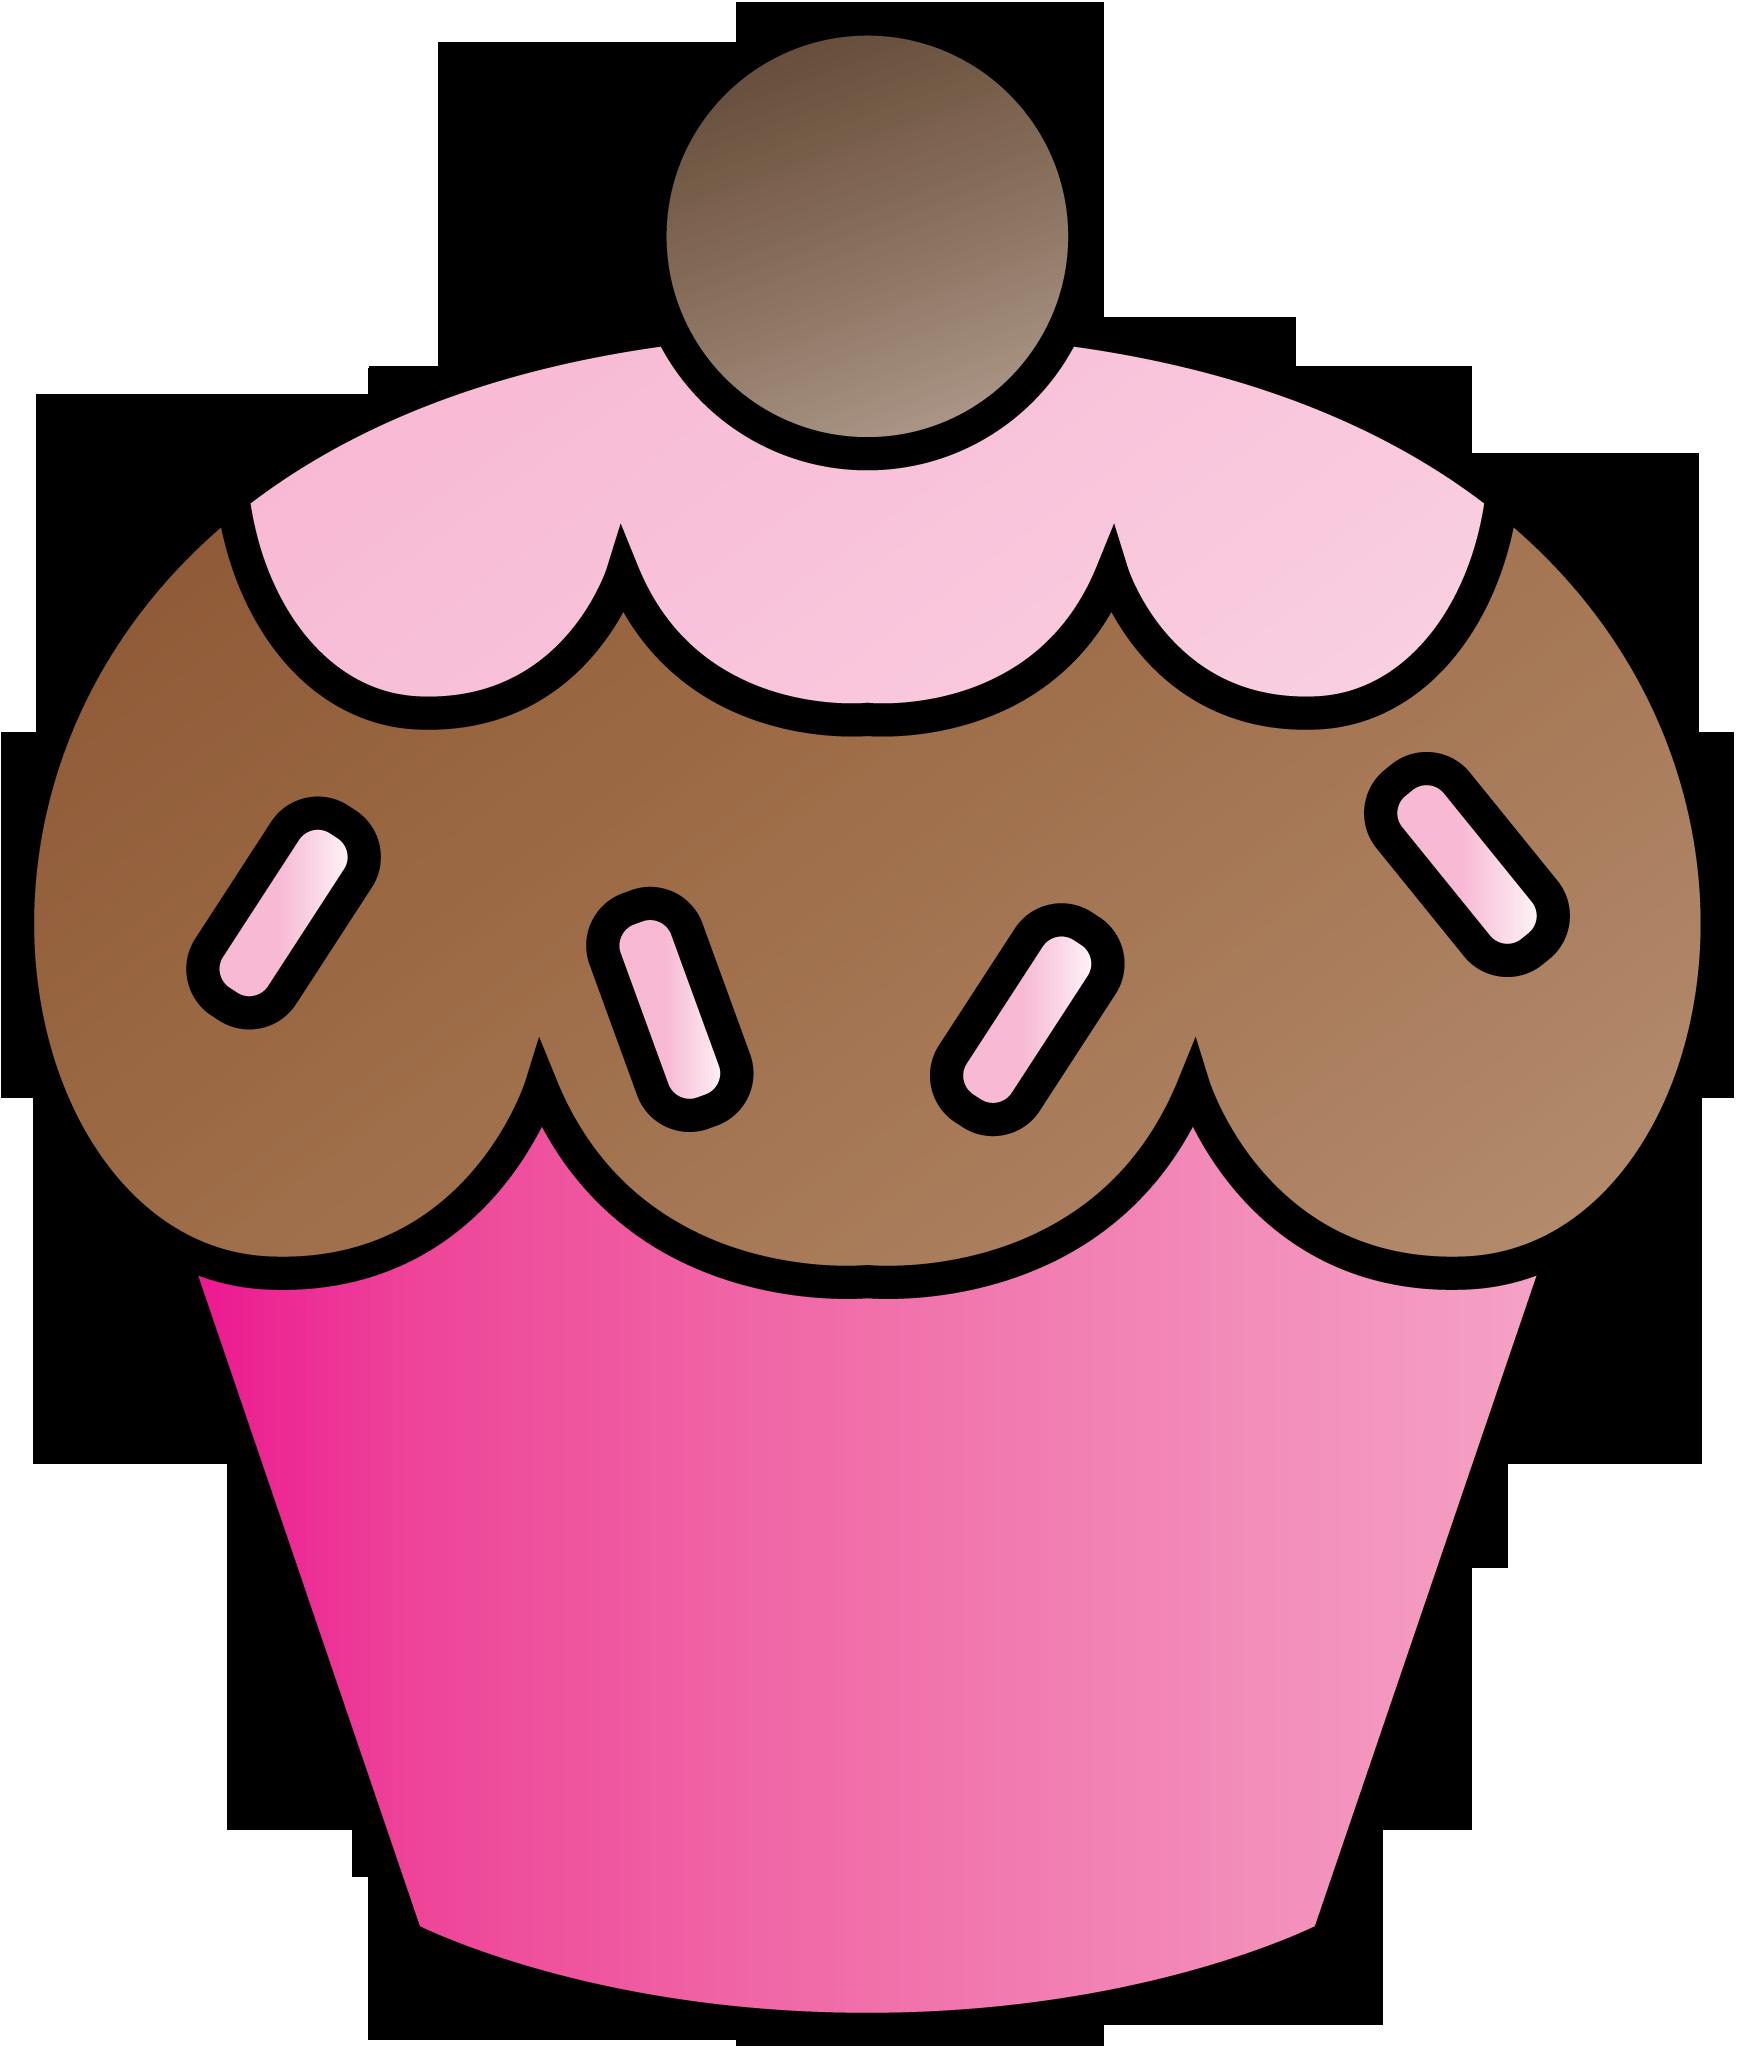 Cupcake Clipart Border - ClipArt - 157.4KB